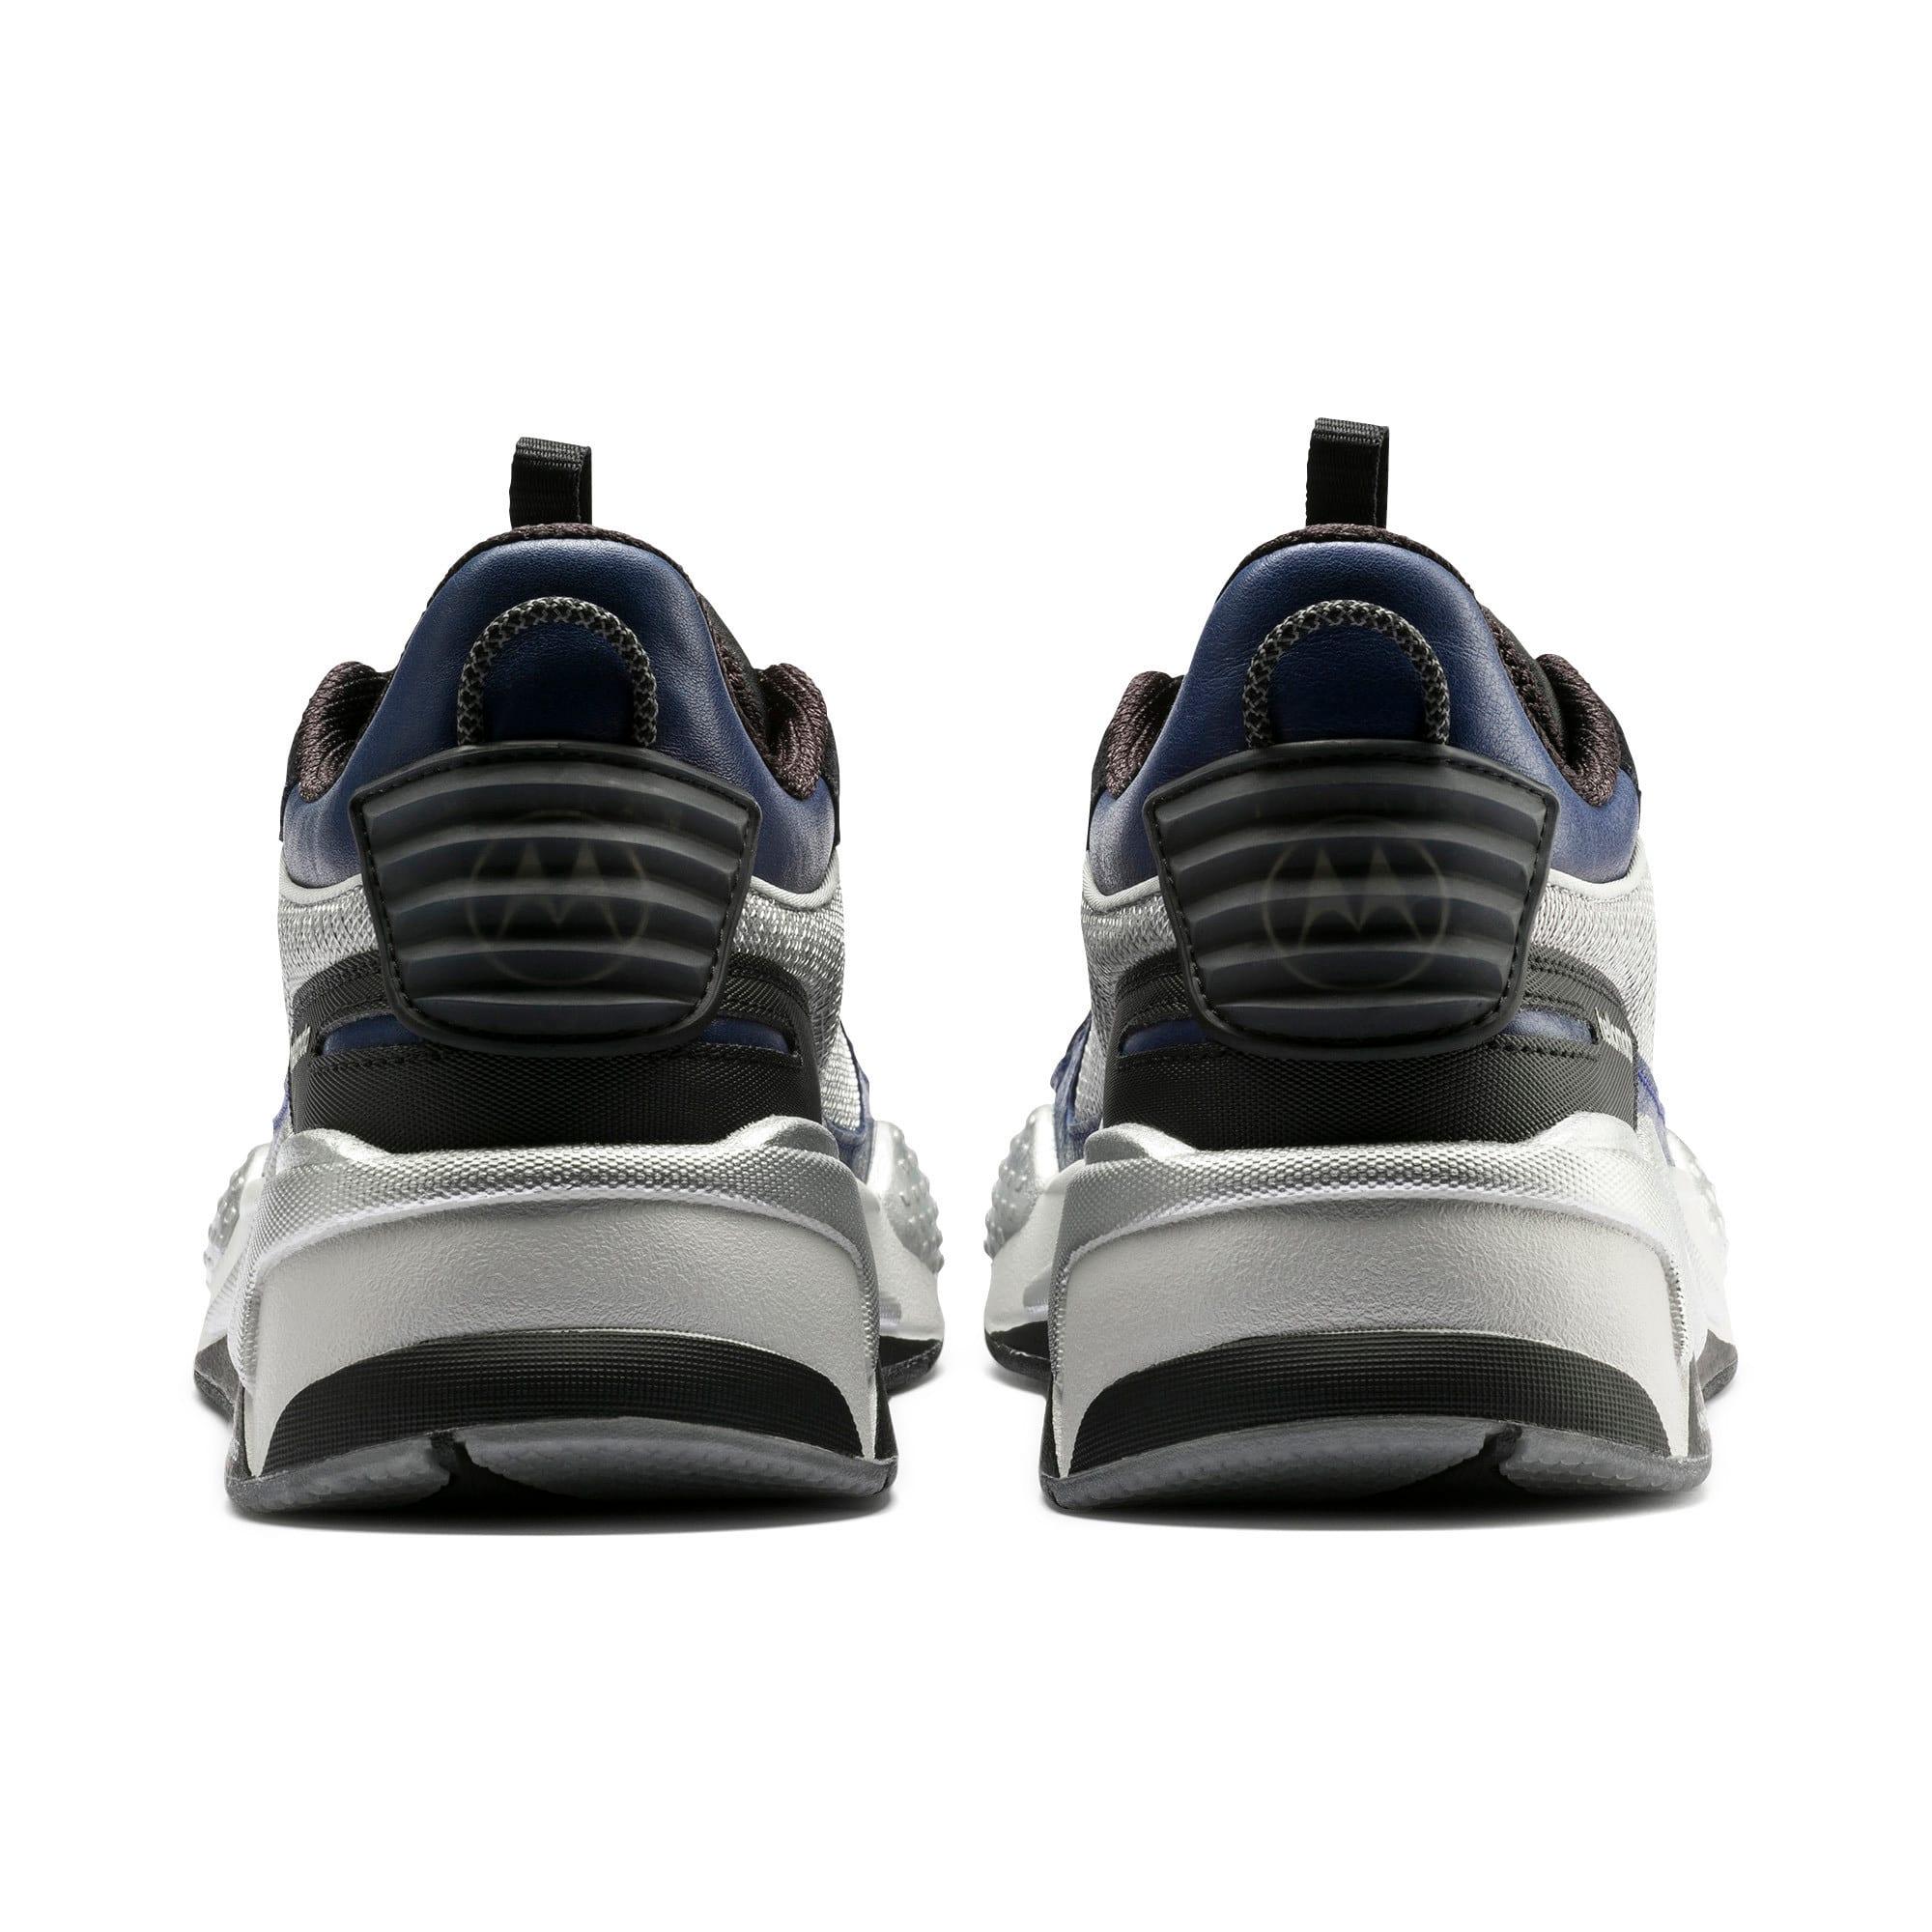 Thumbnail 3 of RS-X Tech Motorola Sneakers, Puma Silver-Sodalite Blue, medium